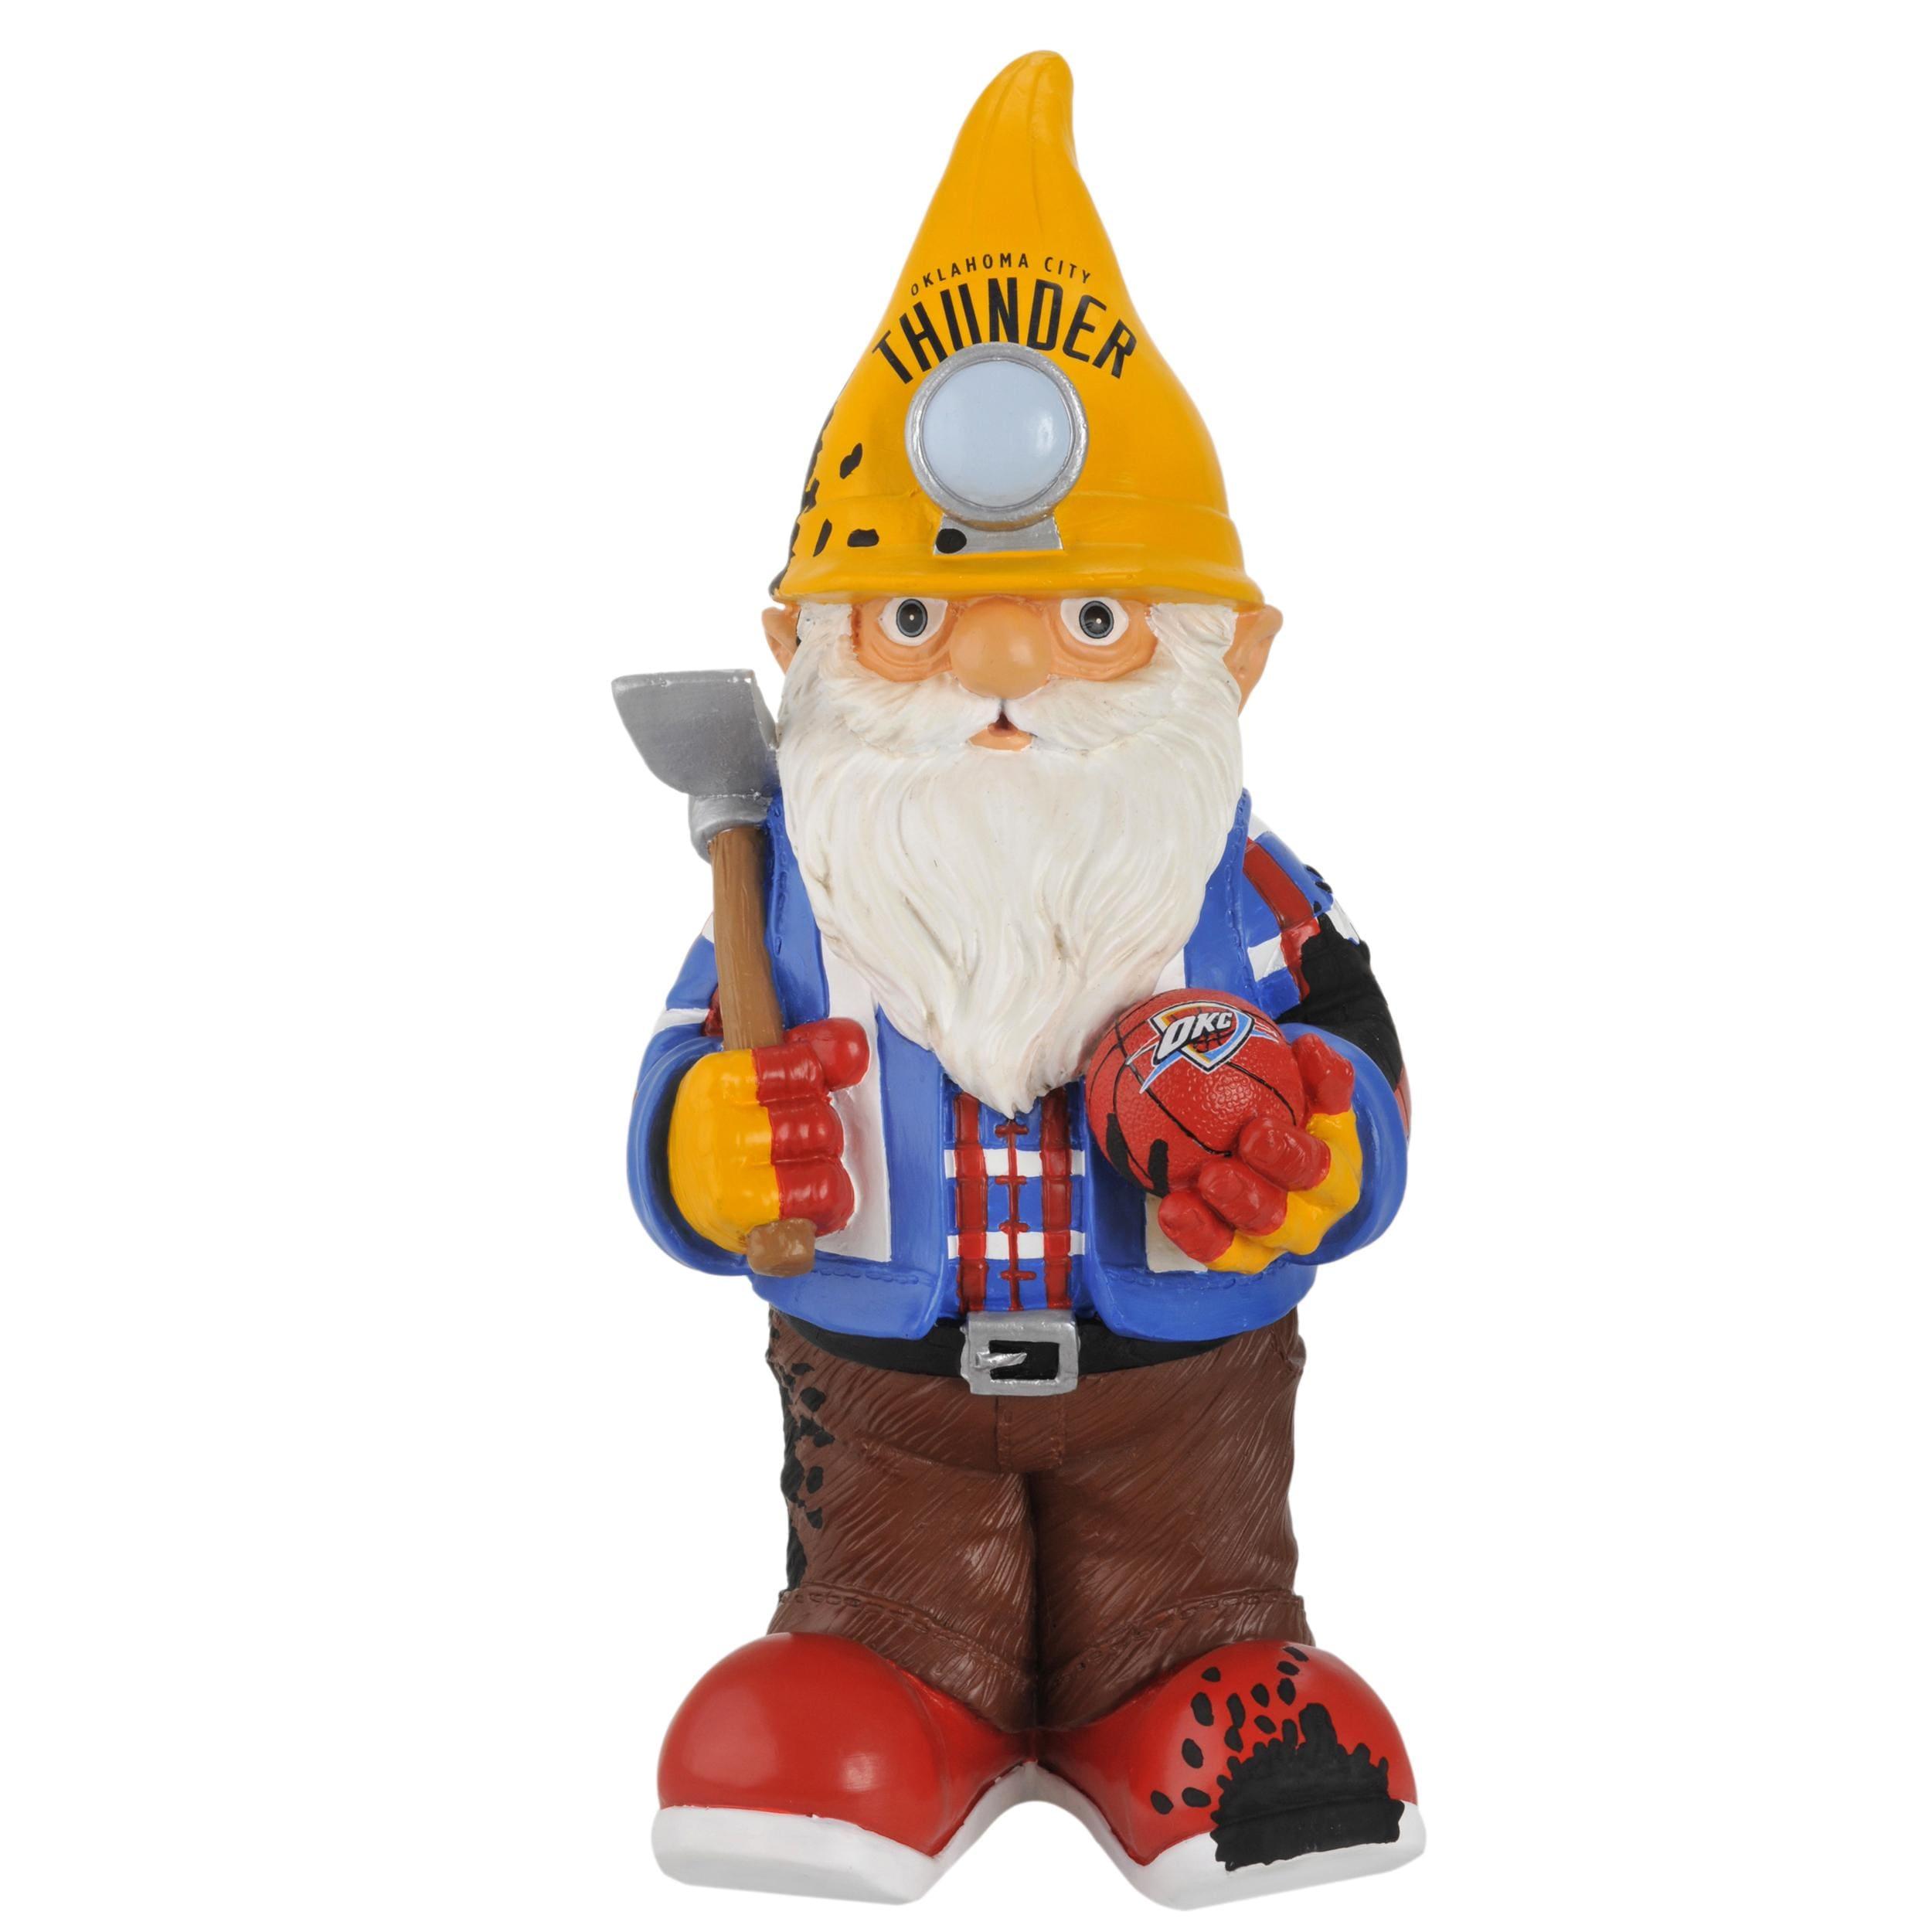 Oklahoma City Thunder 11-inch Thematic Garden Gnome